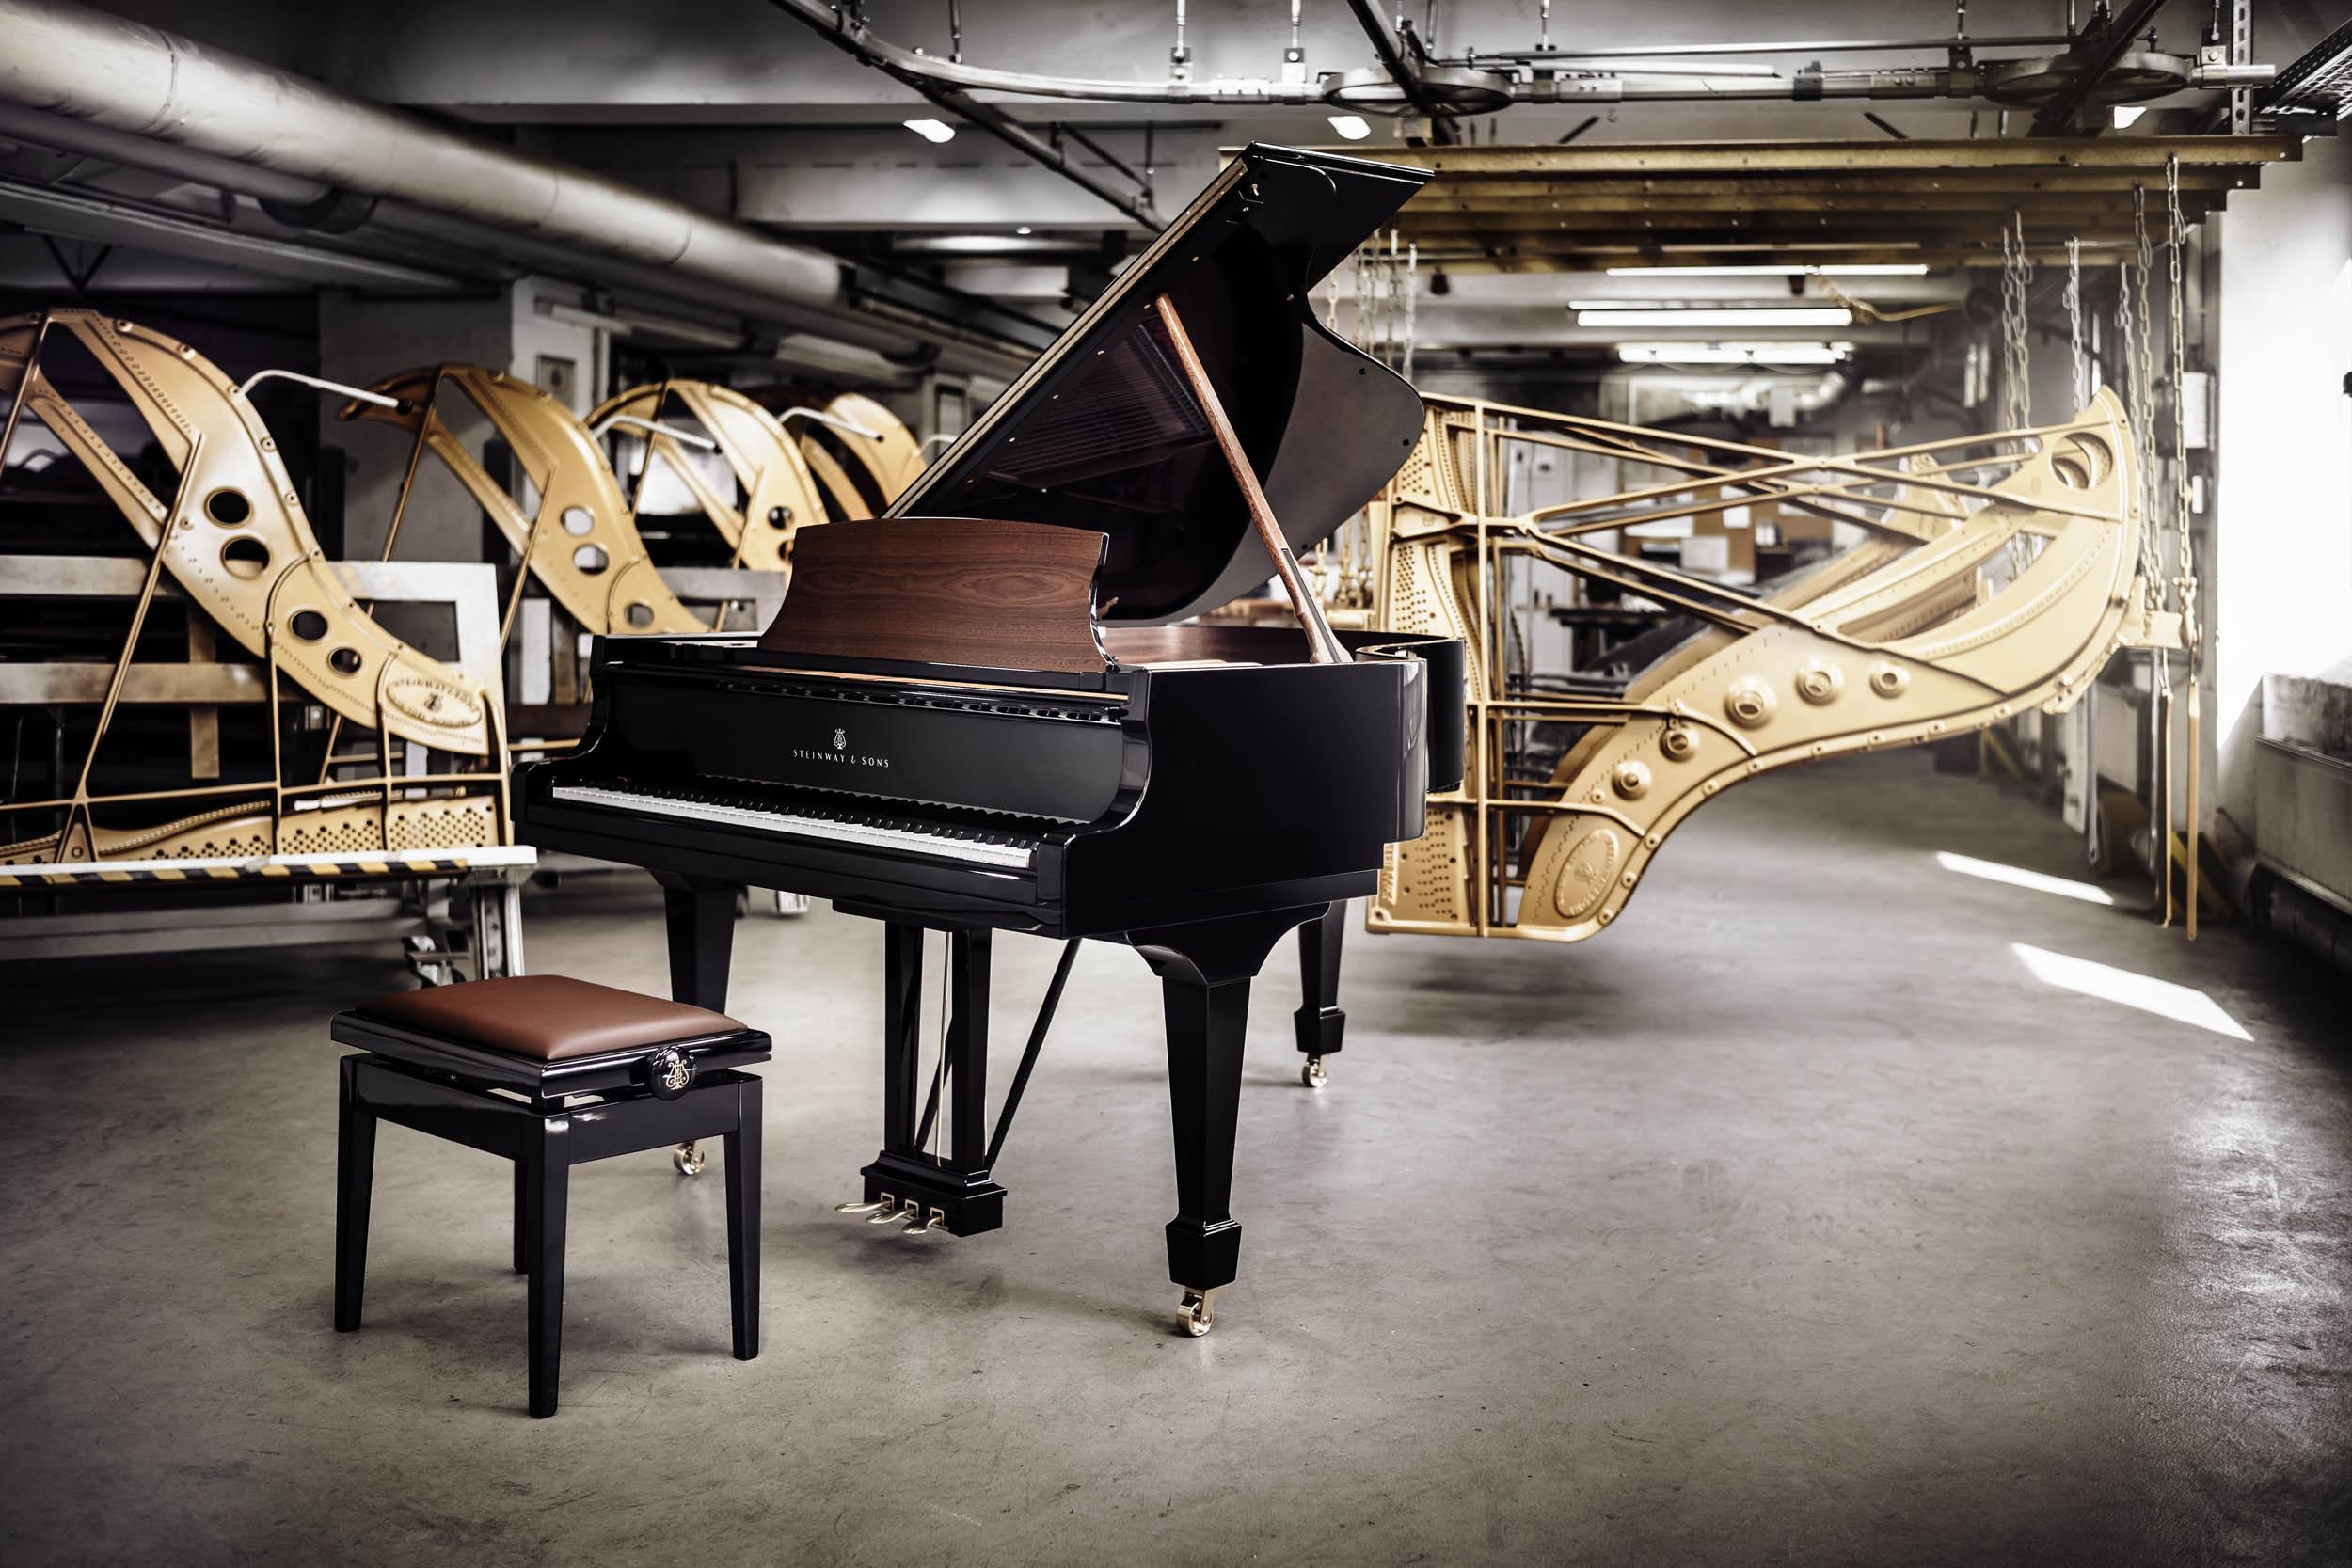 2019-SeifertUebler-steinway-piano-005.jpg